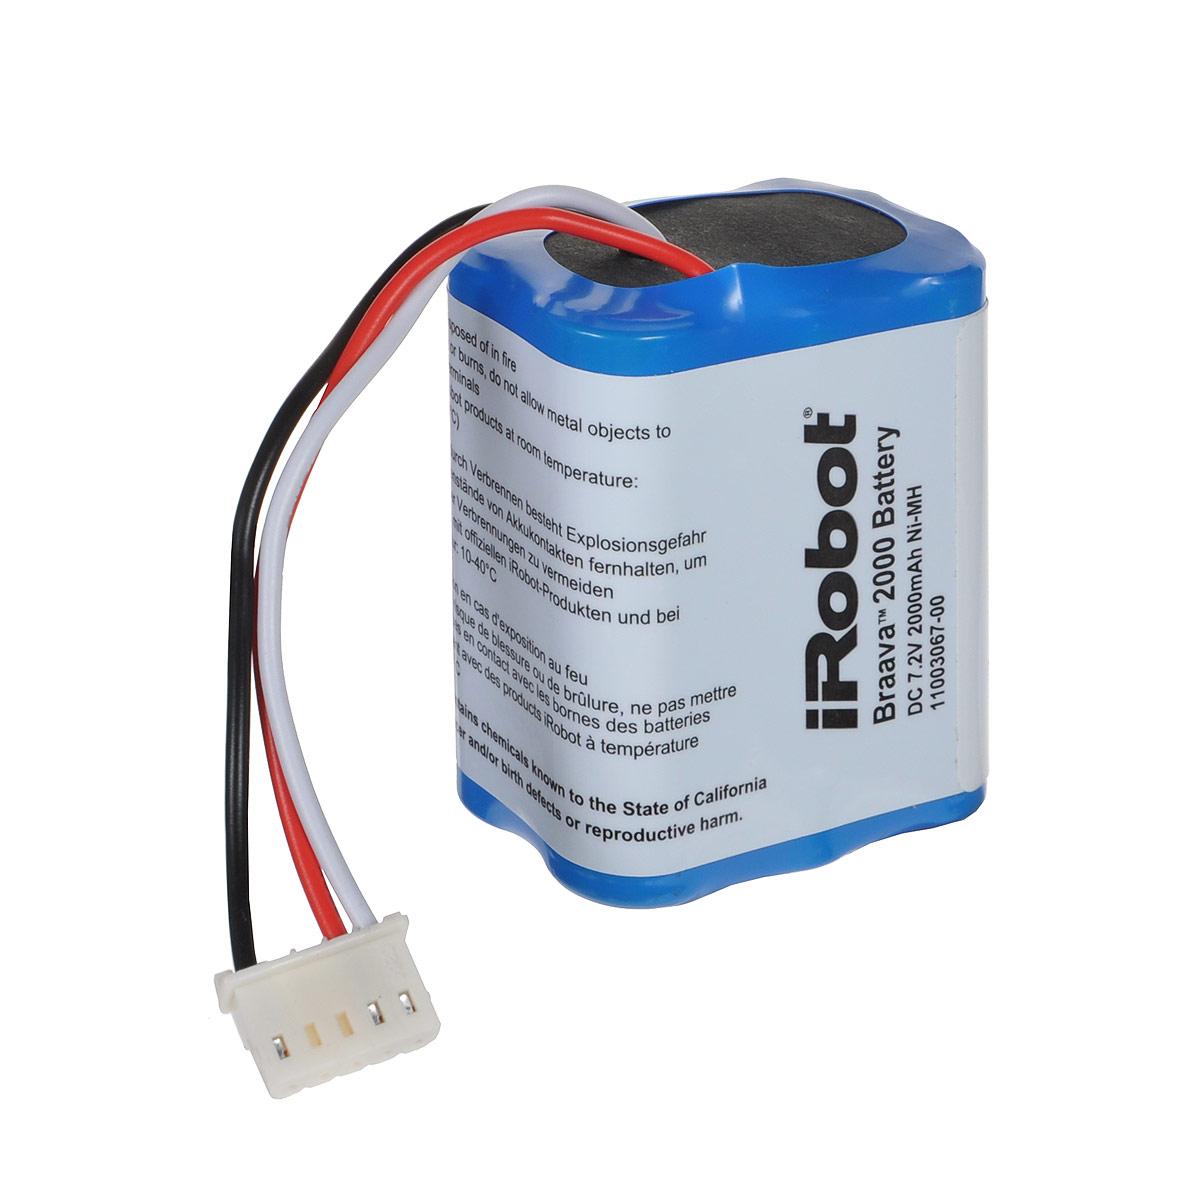 iRobot аккумуляторная батарея NiMH для Braava 380/390t горячая нет газ usb электронная аккумуляторная батарея непламено прикуривателя белый